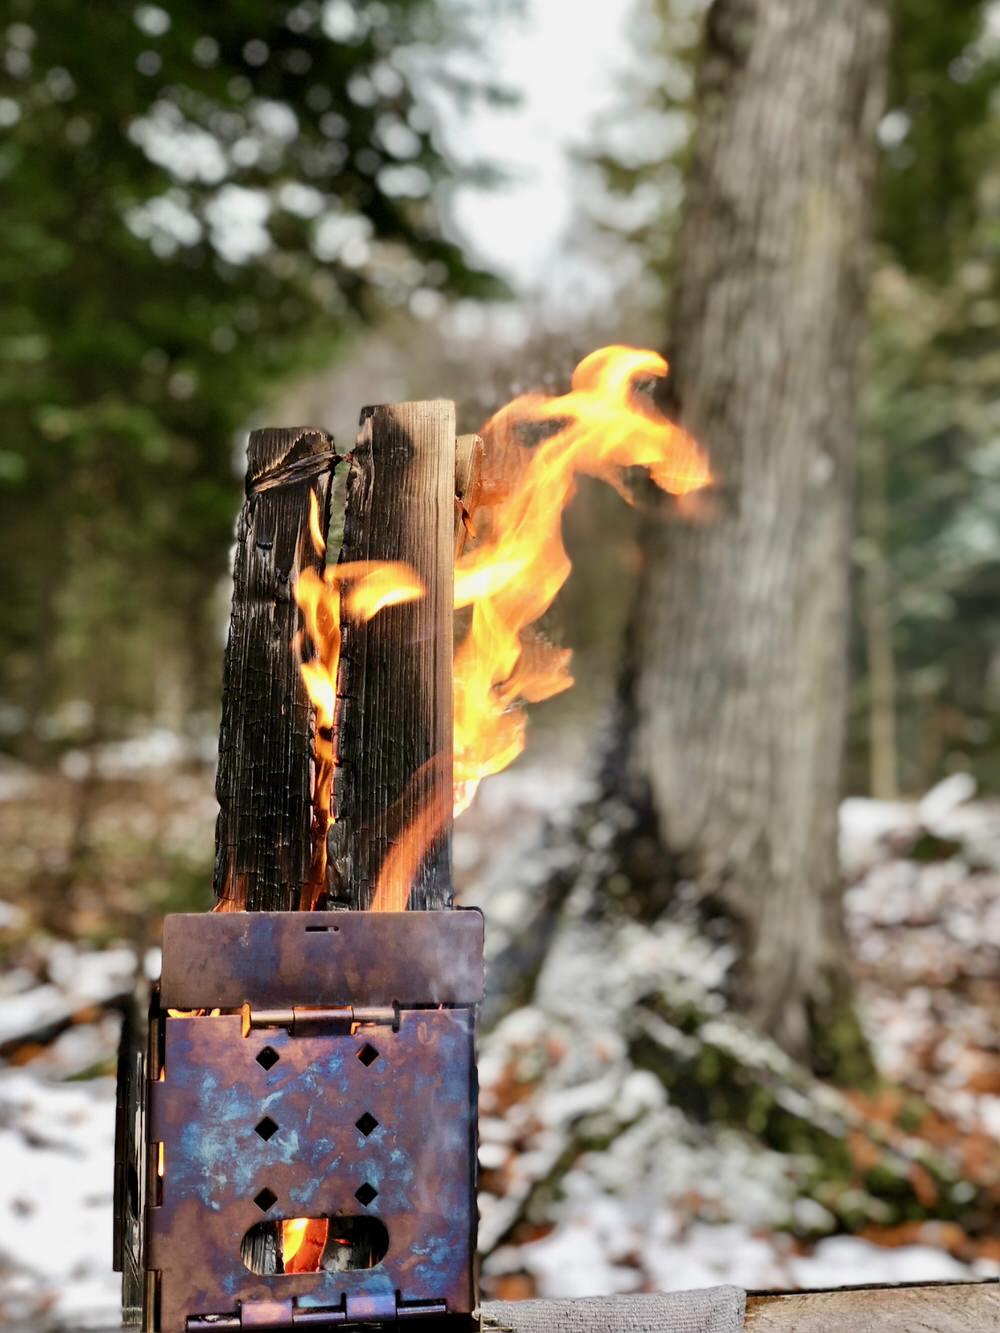 Feu dans une Firebox